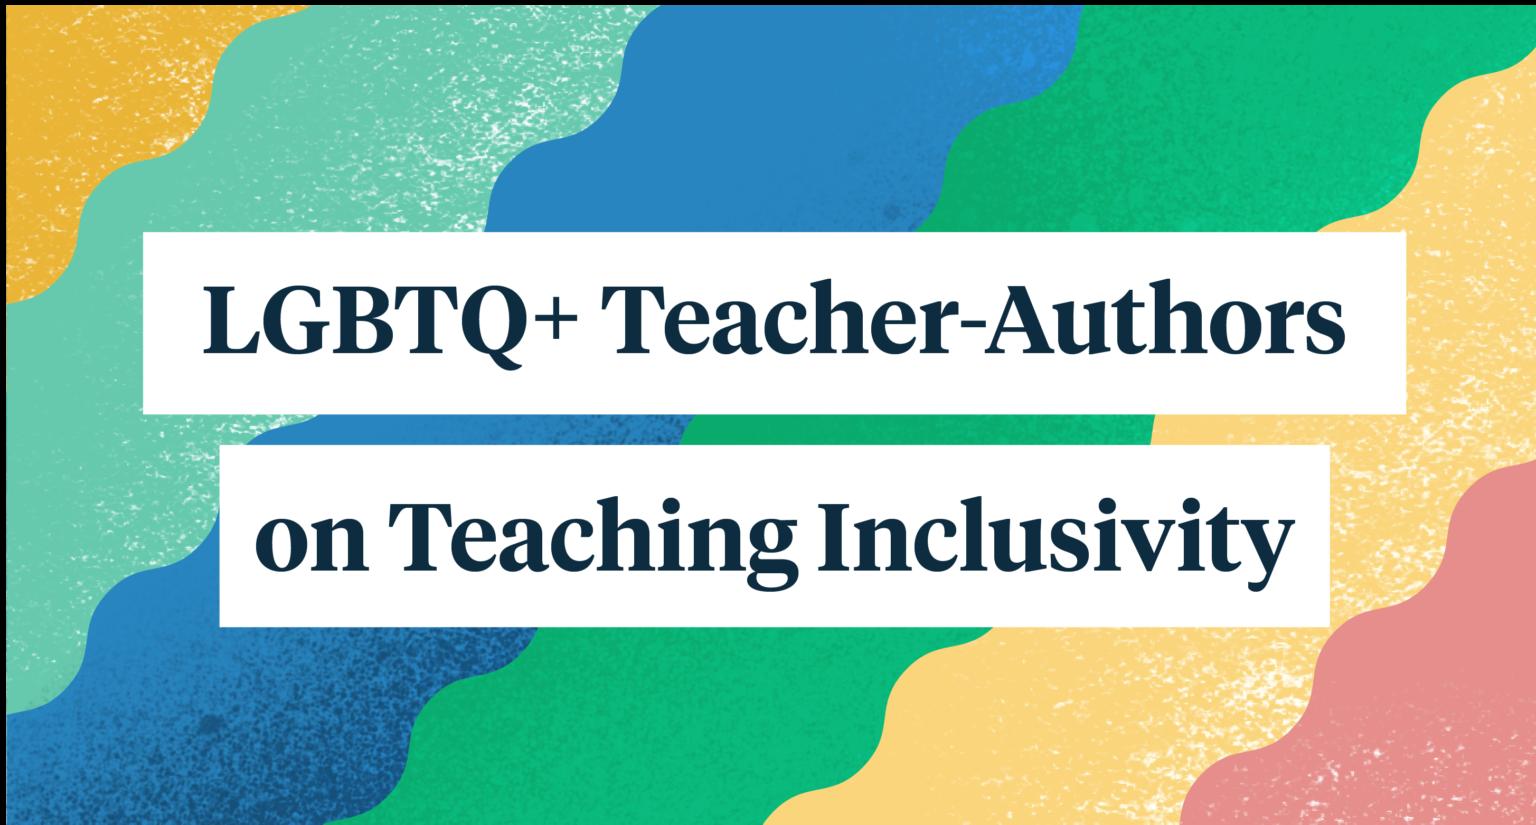 LBGTQ+ Teacher-Authors on Teaching Inclusivity